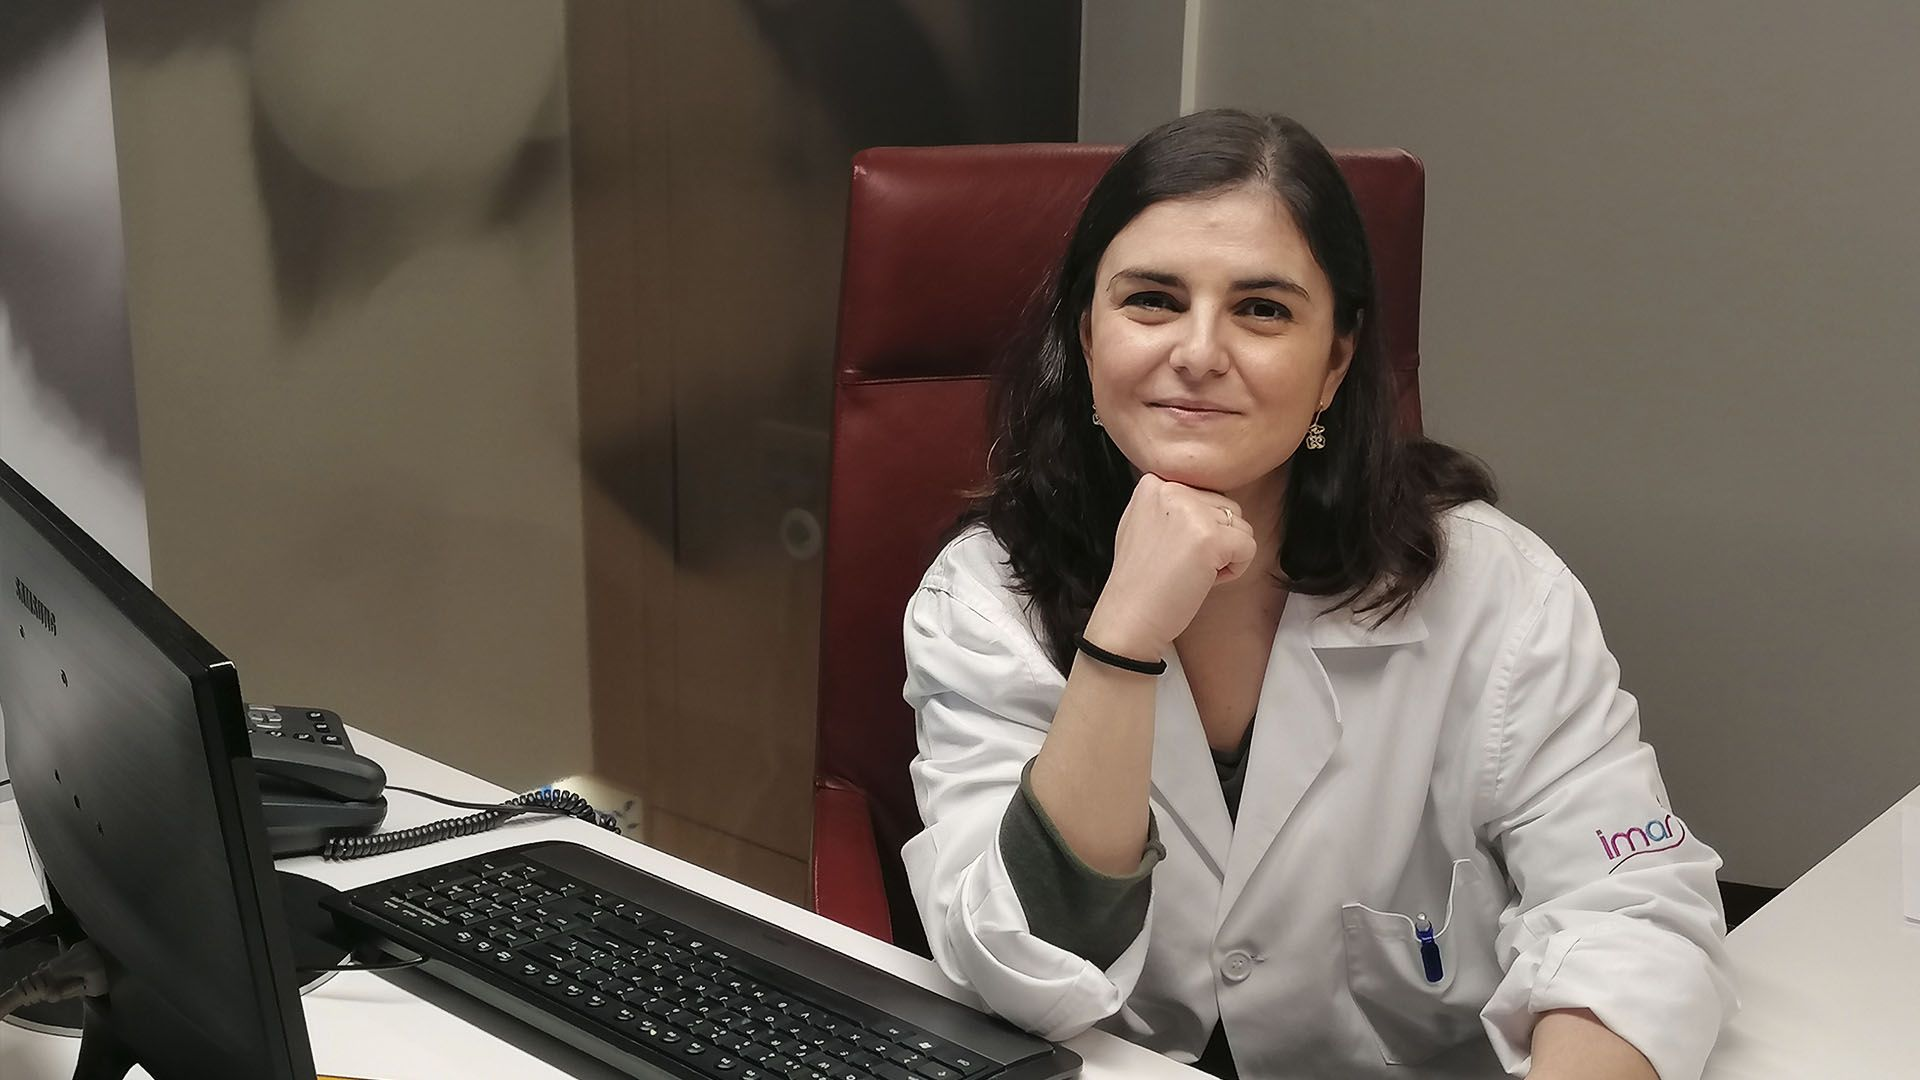 Dra. Purificación Calero